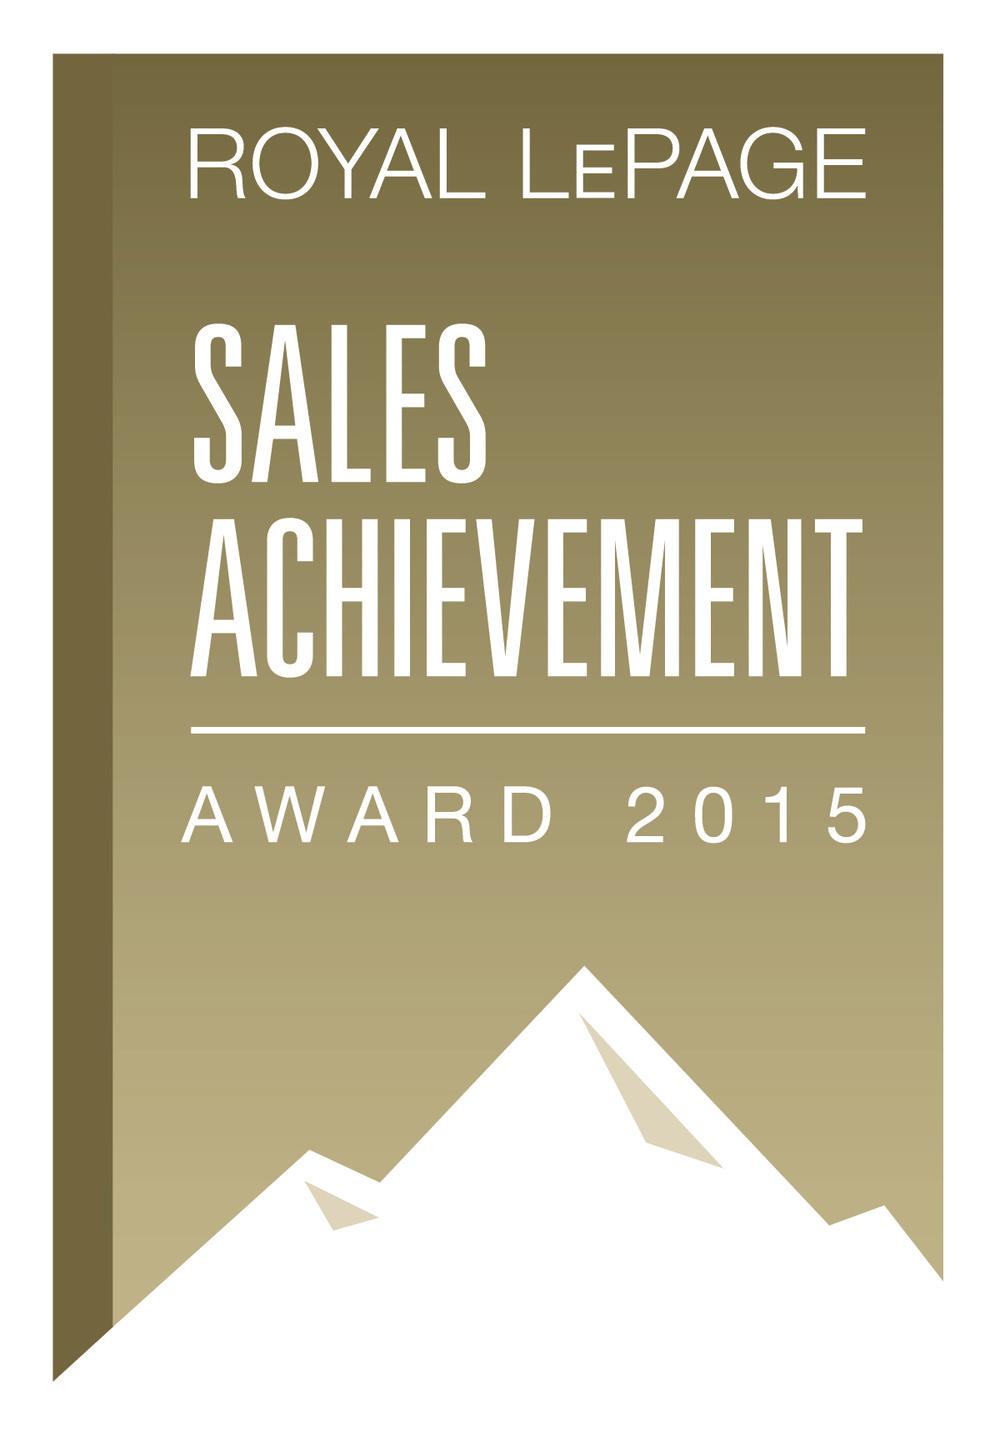 RLP-SalesAchievement-2015-EN-CMYK.jpg